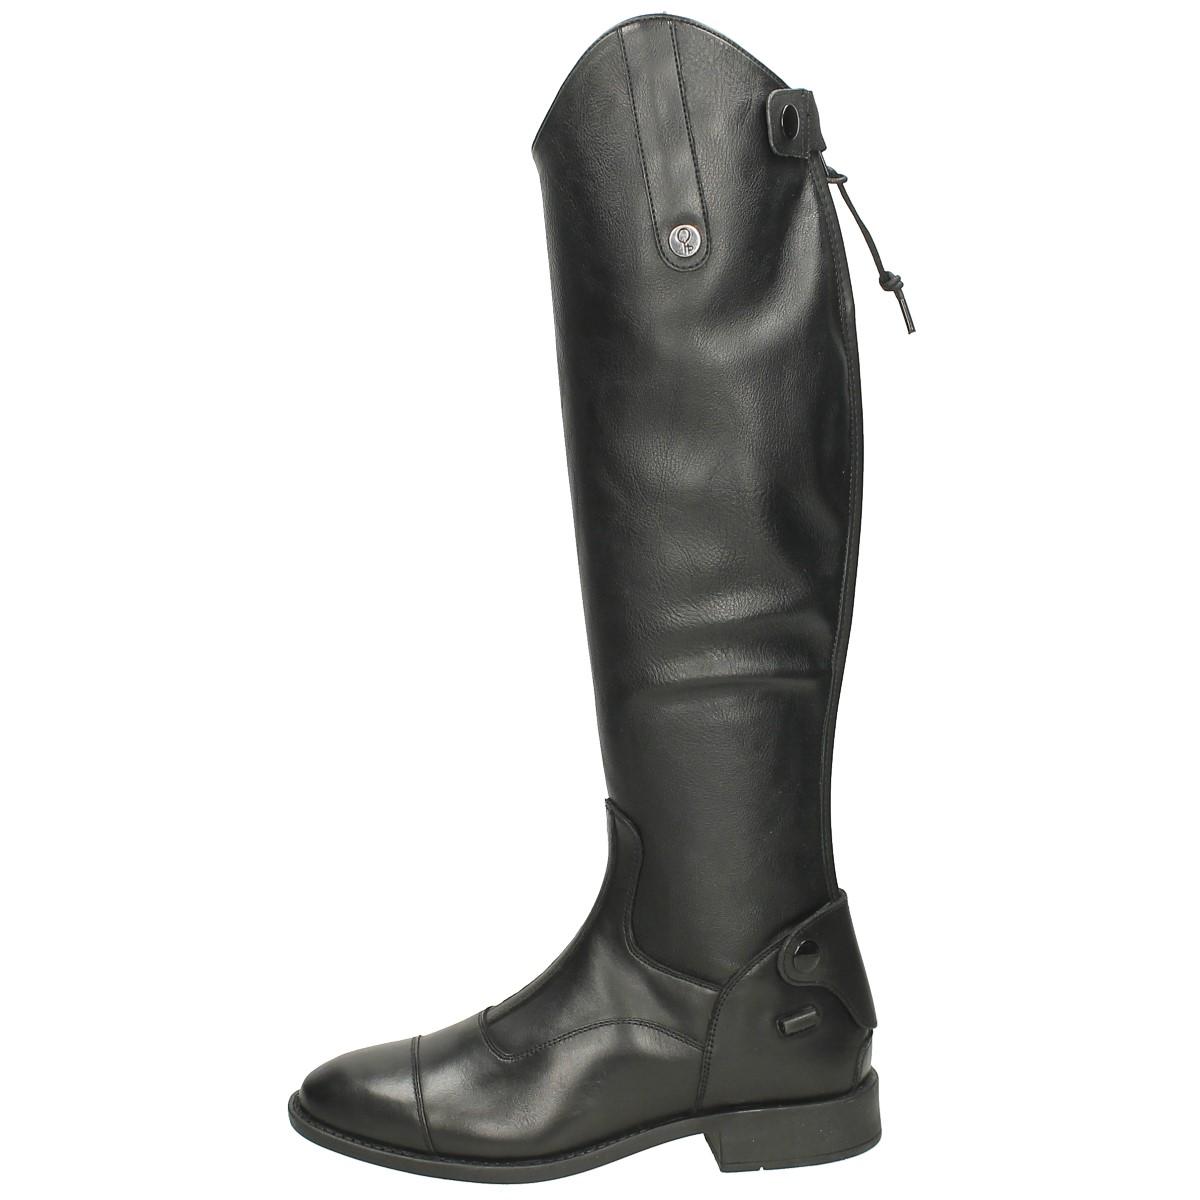 boots-qhp-birgit_1500x1500_68713.jpg